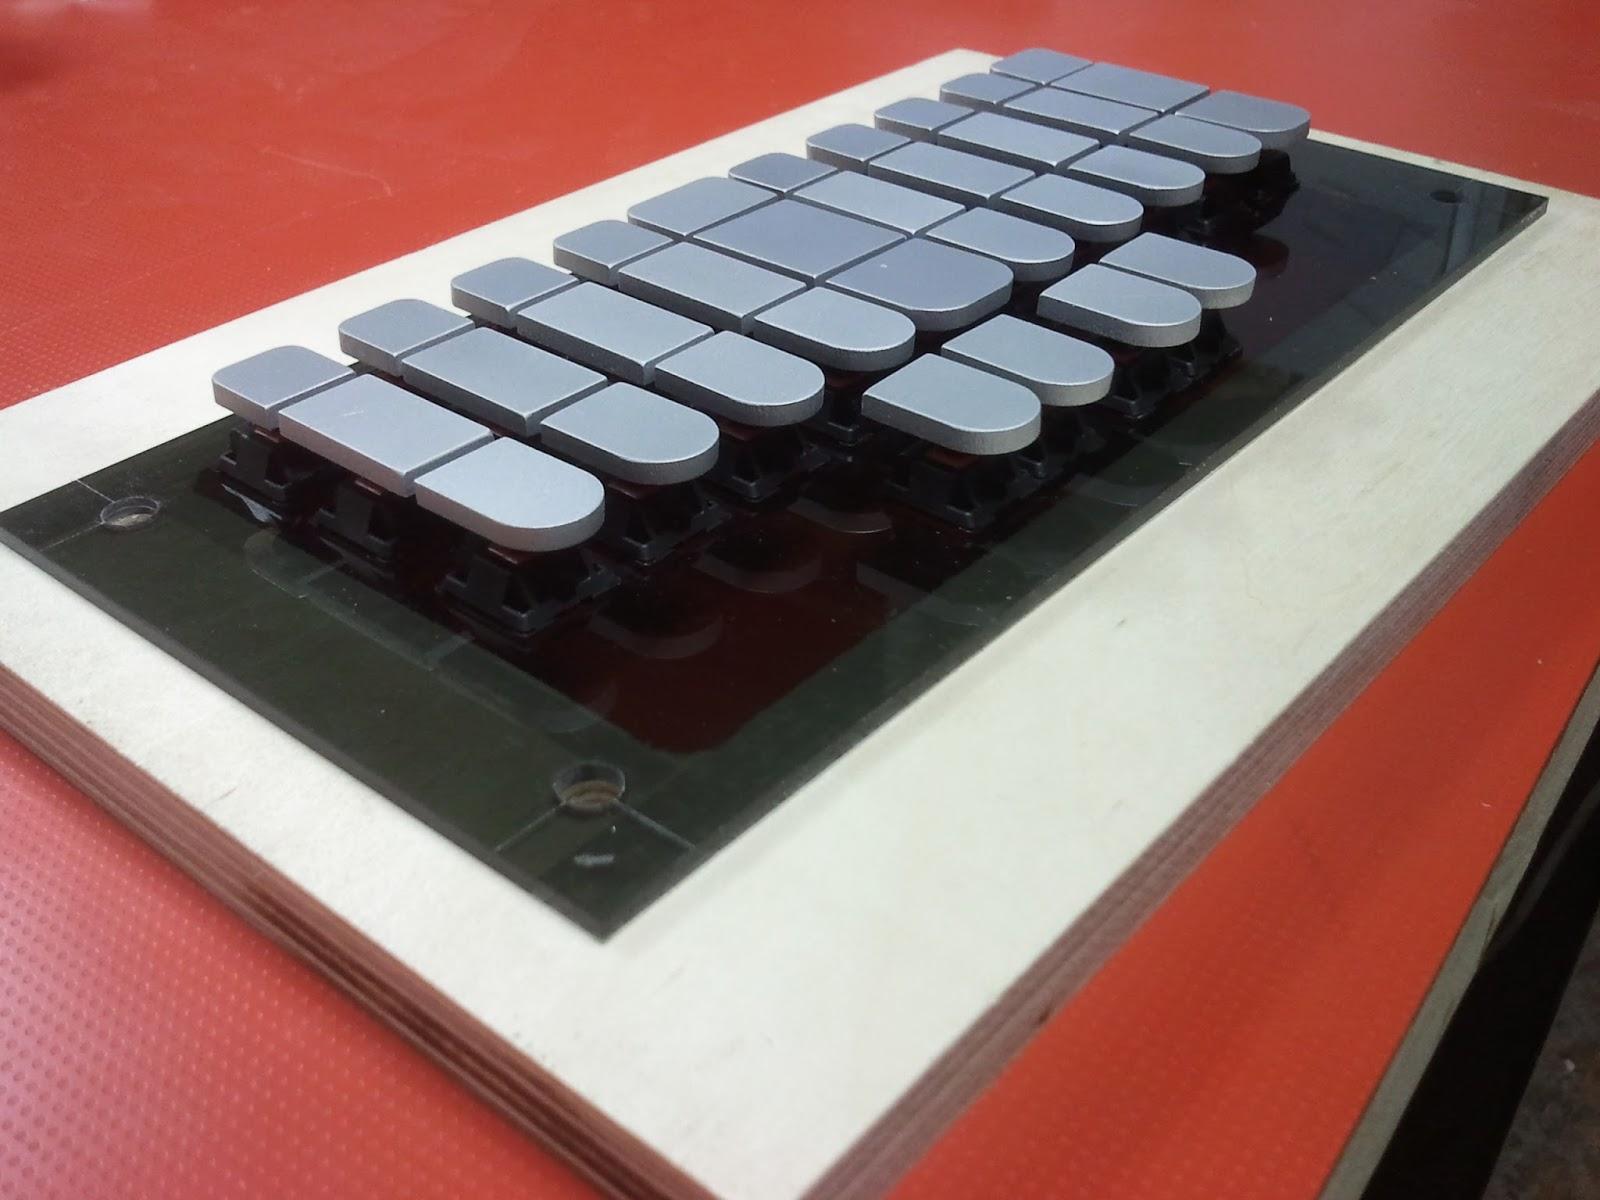 Stenosaurus stenography keyboard prototype - deskthority